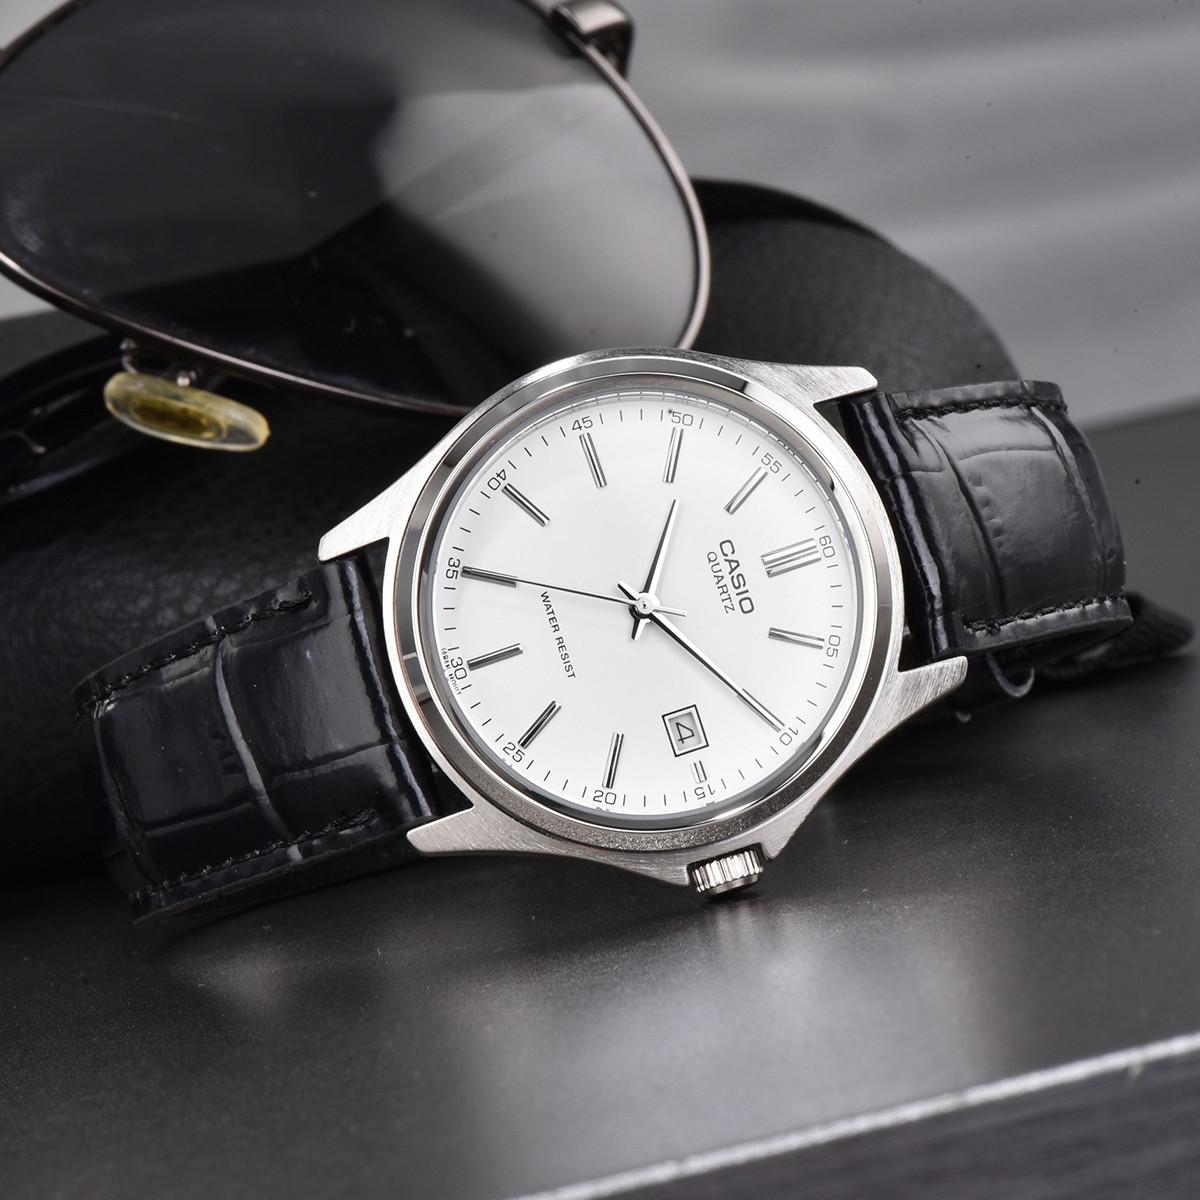 CASIO 卡西欧 指针系列 MTP-1183E-7ADF-L  男士商务石英手表